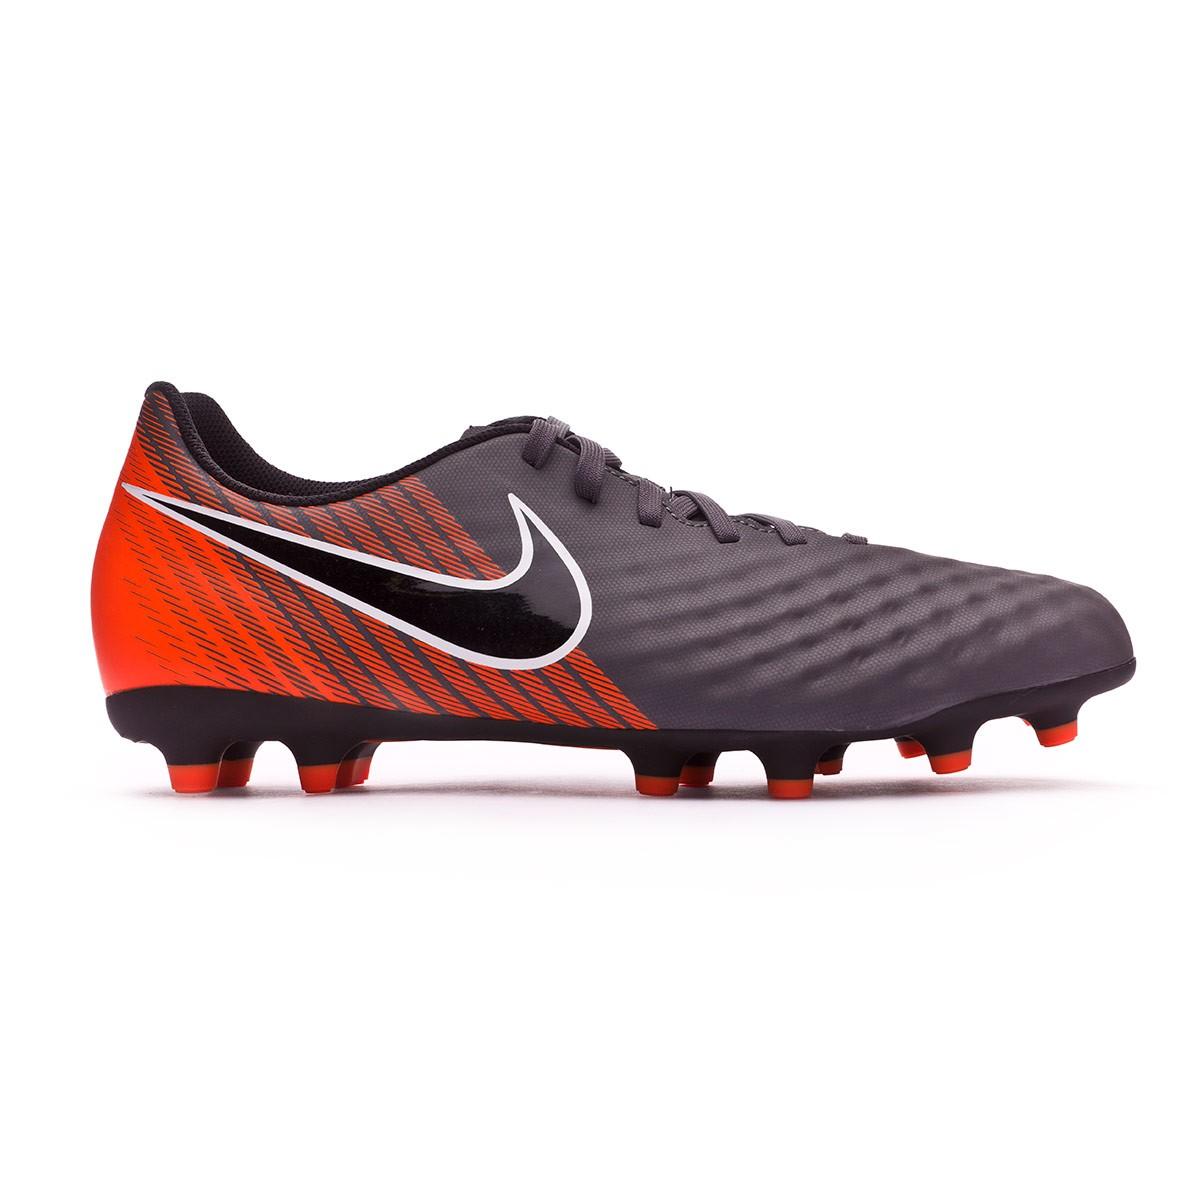 Total Club Ii Nike Fg Bota Black Obra Magista De Dark Fútbol Grey P80wknOX